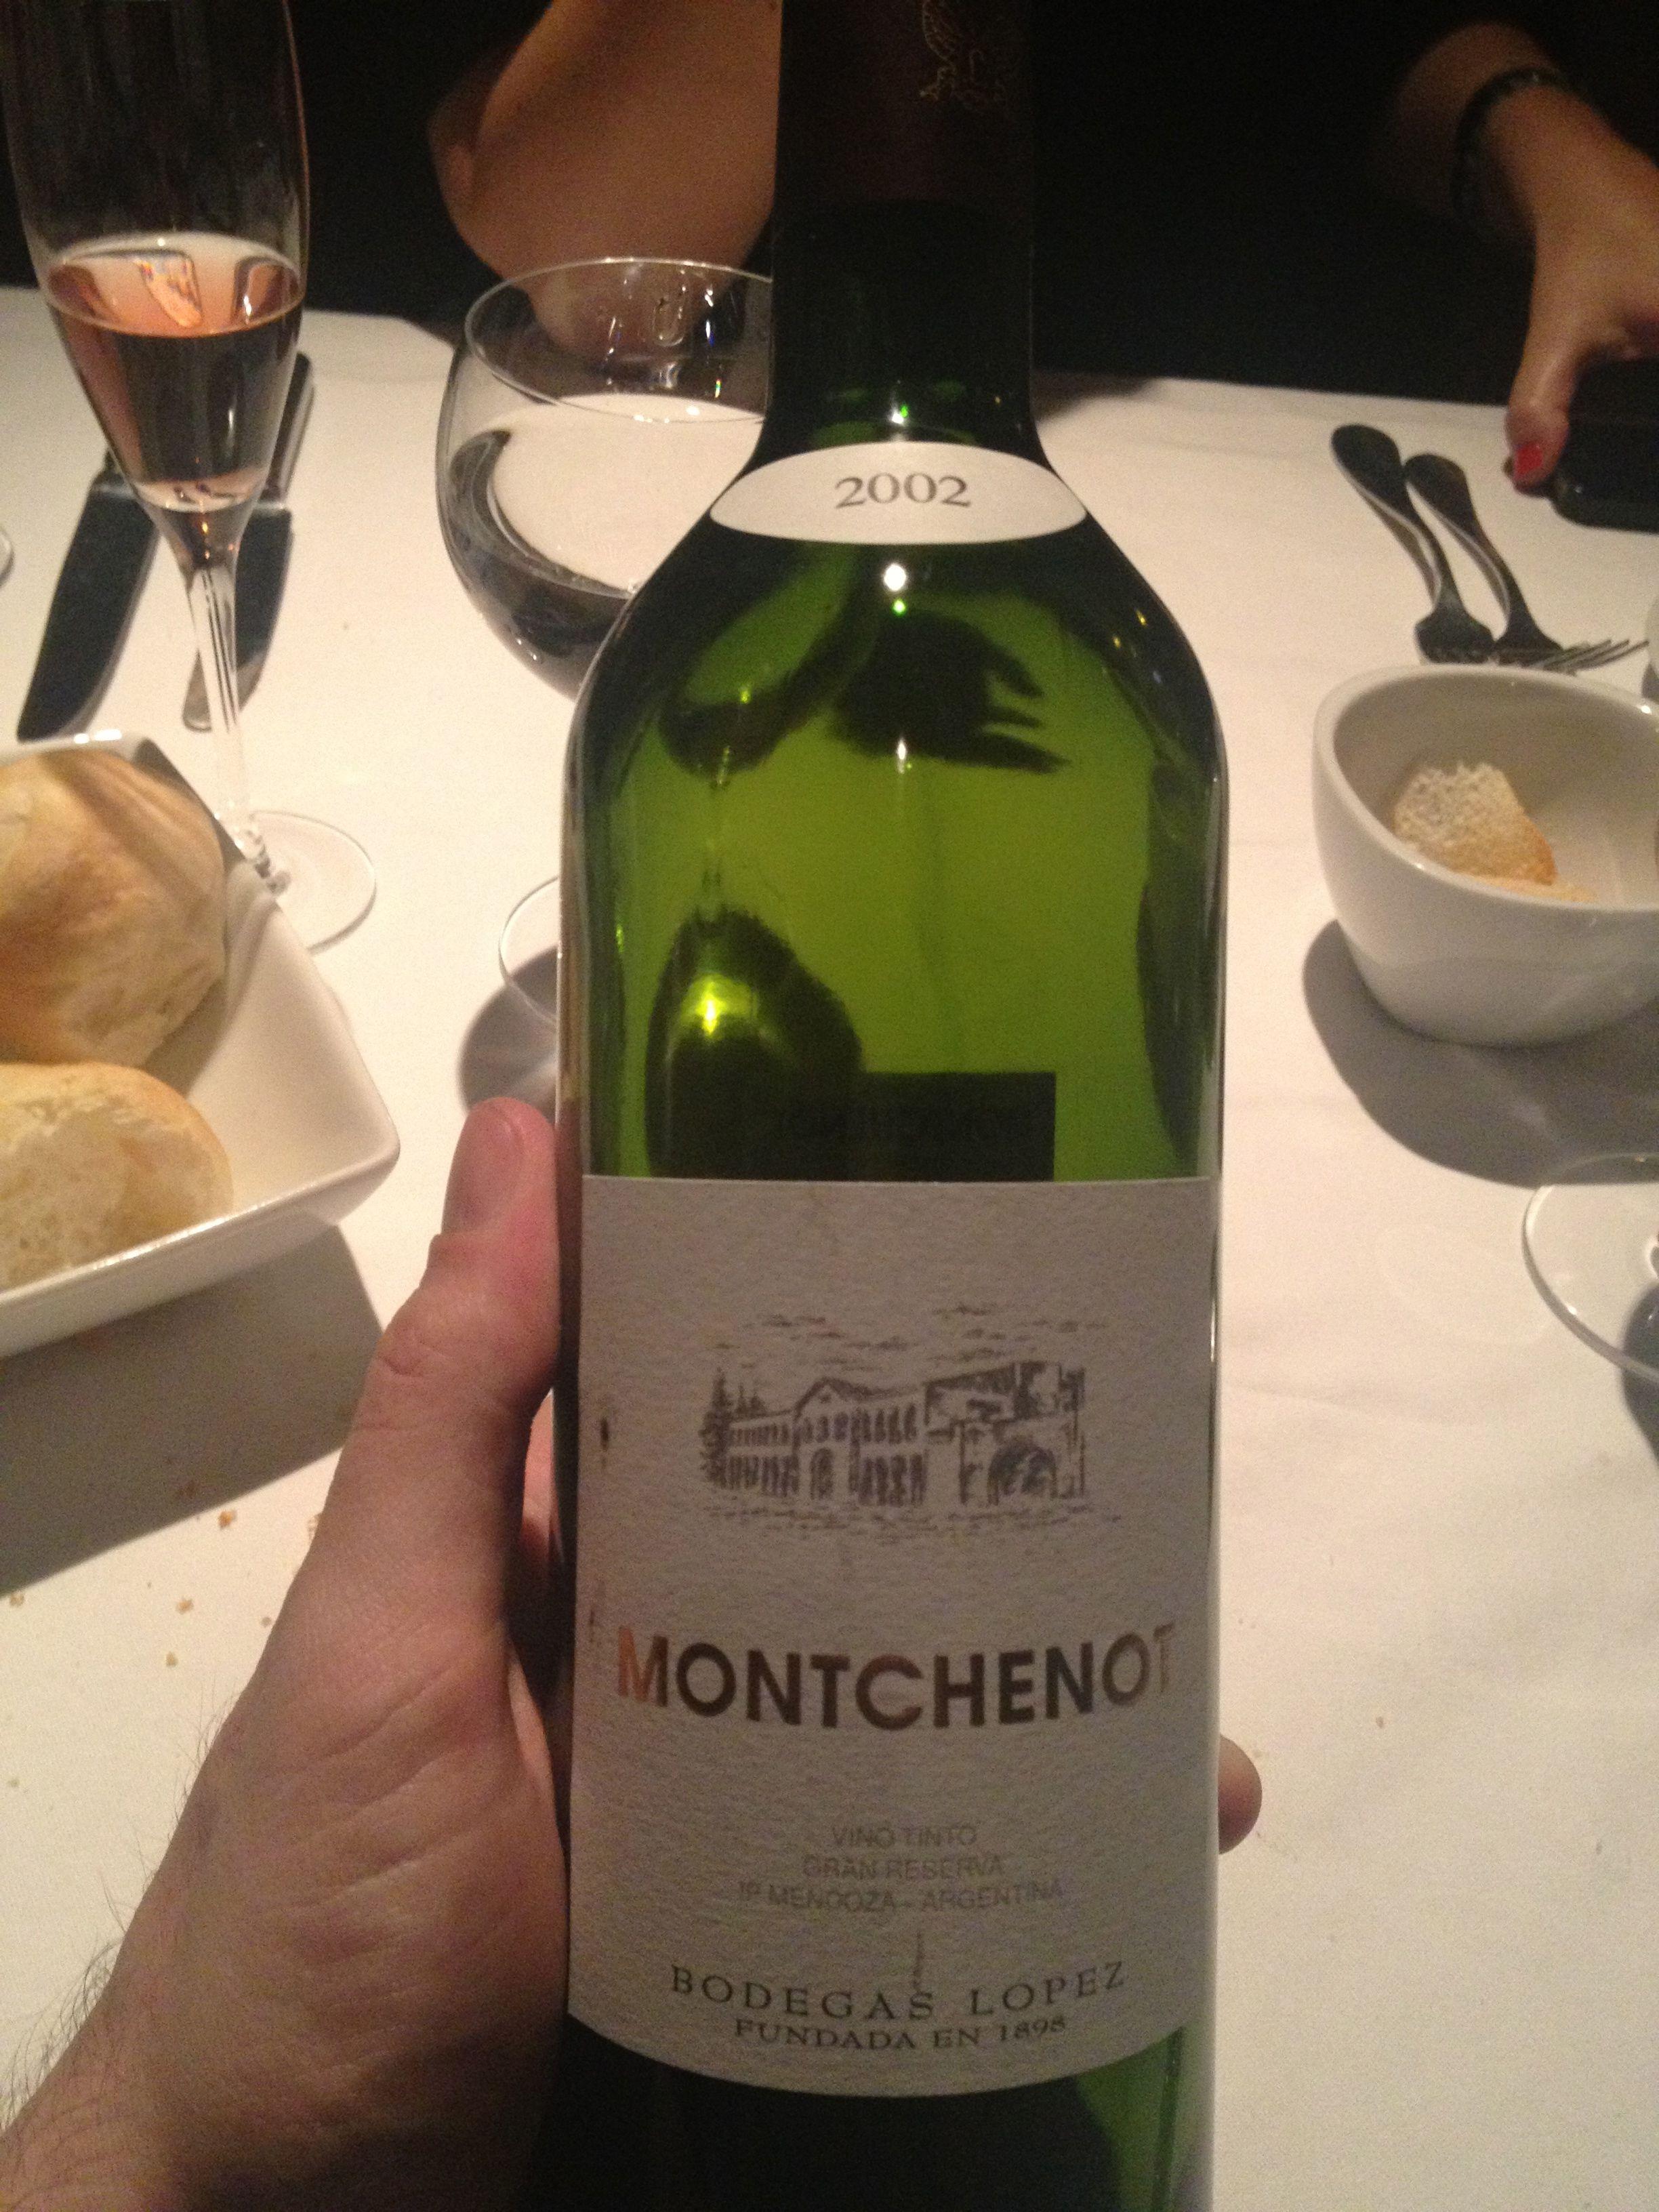 Montchenot - Blend - 2002 - Lopez - Mendoza, Argentina